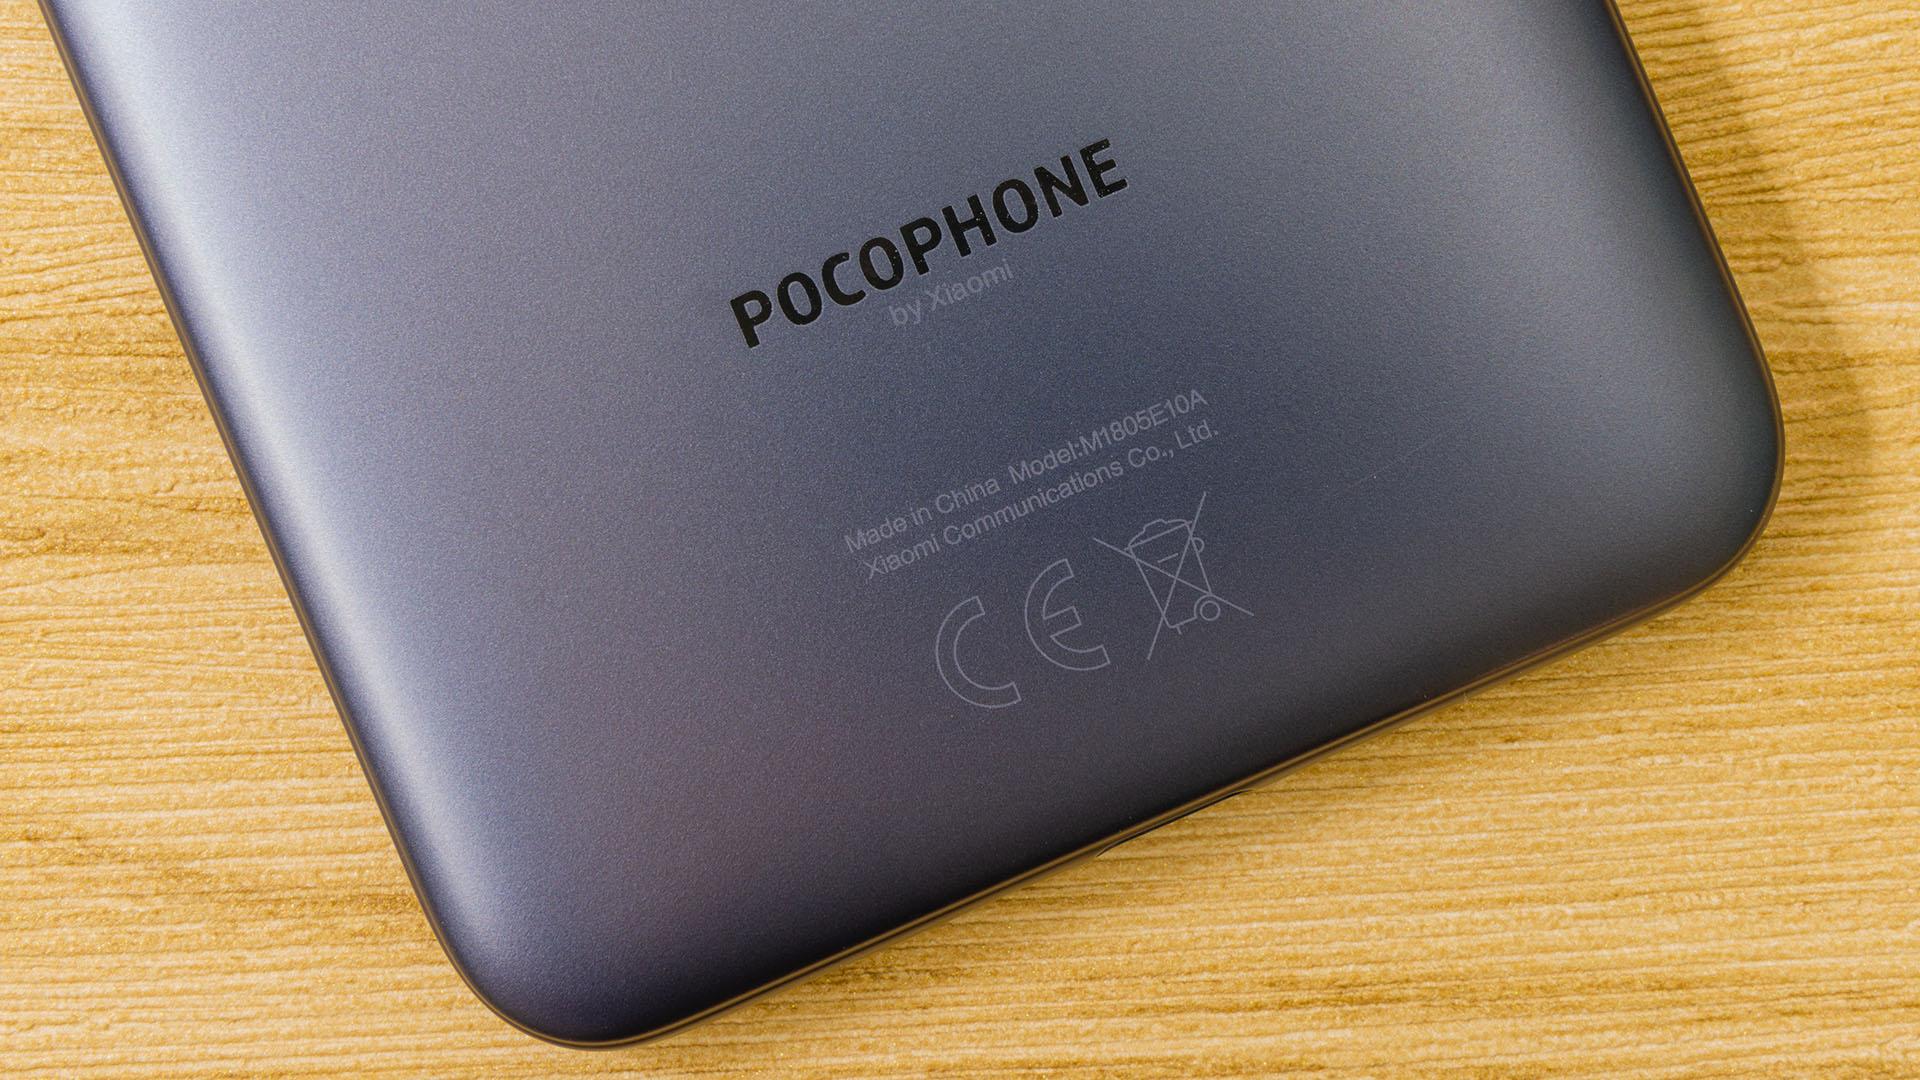 Review Pocophone F1 The True Flagship Killer Nasi Lemak Tech By Xiaomi 6gb 64gb